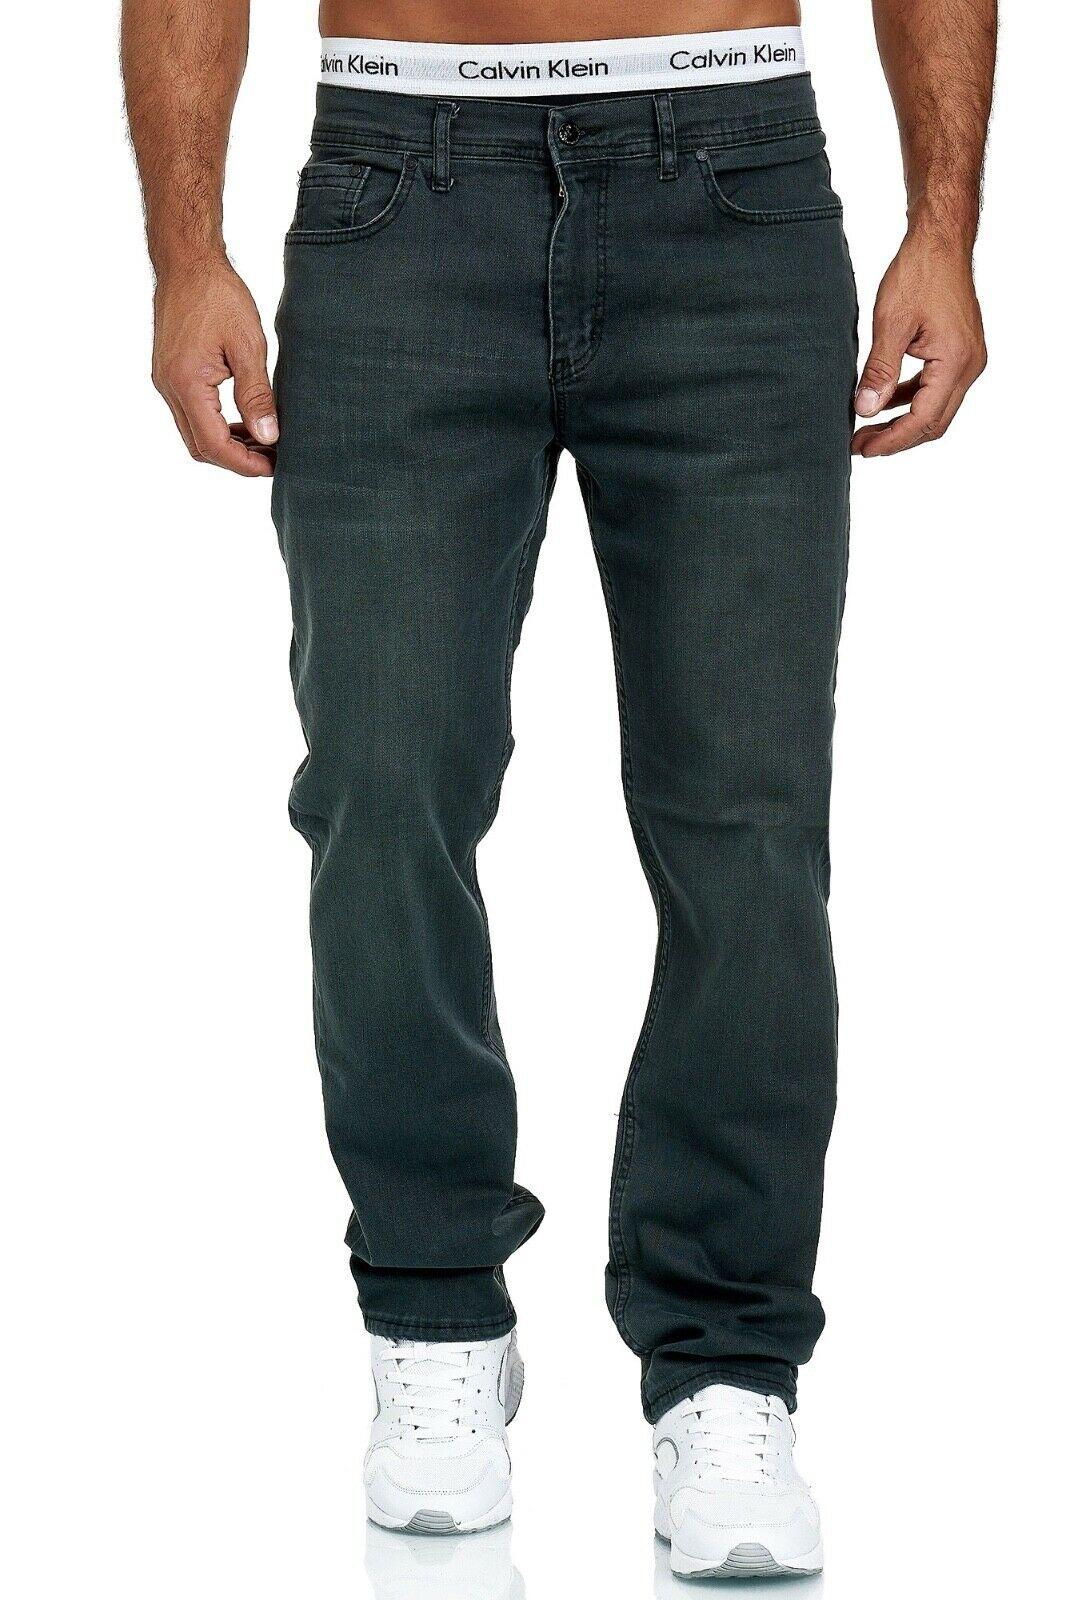 Herren-Jeans-Hose-Denim-KC-Black-Washed-Straight-Cut-Regular-Dicke-Naht-naehte Indexbild 46